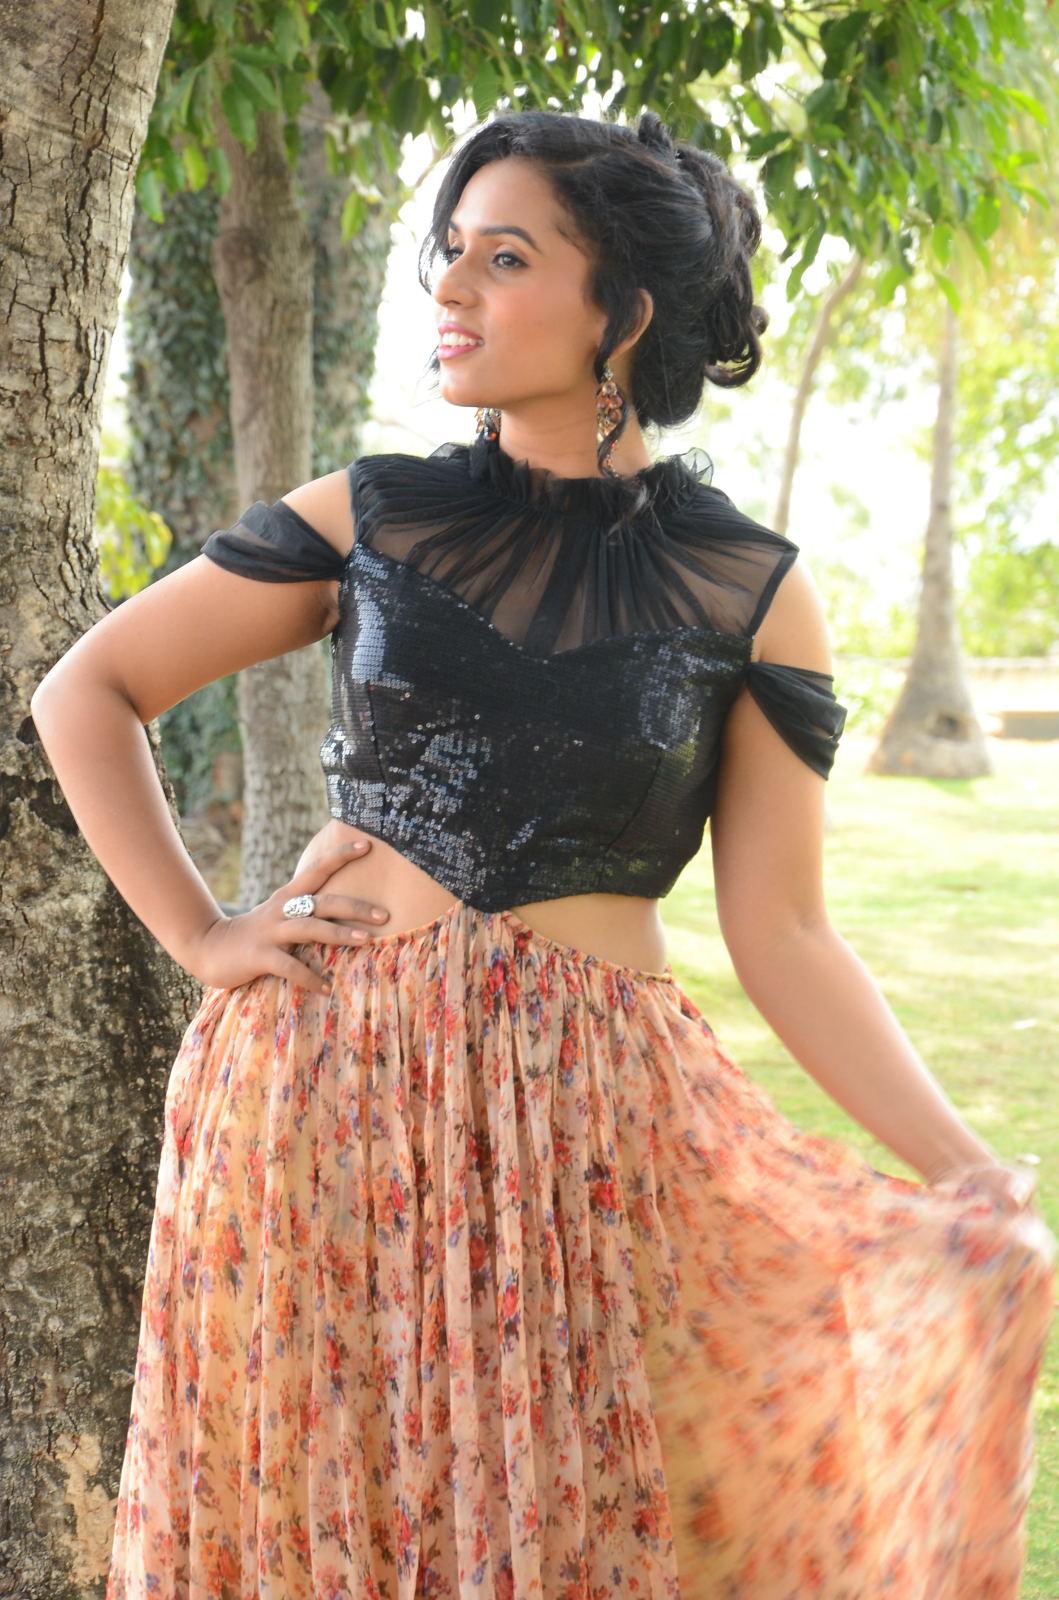 chetana uttej Brand New Photo Stills Of South Actress Chetana Uttej | Tollywood Chetana Uttej 14